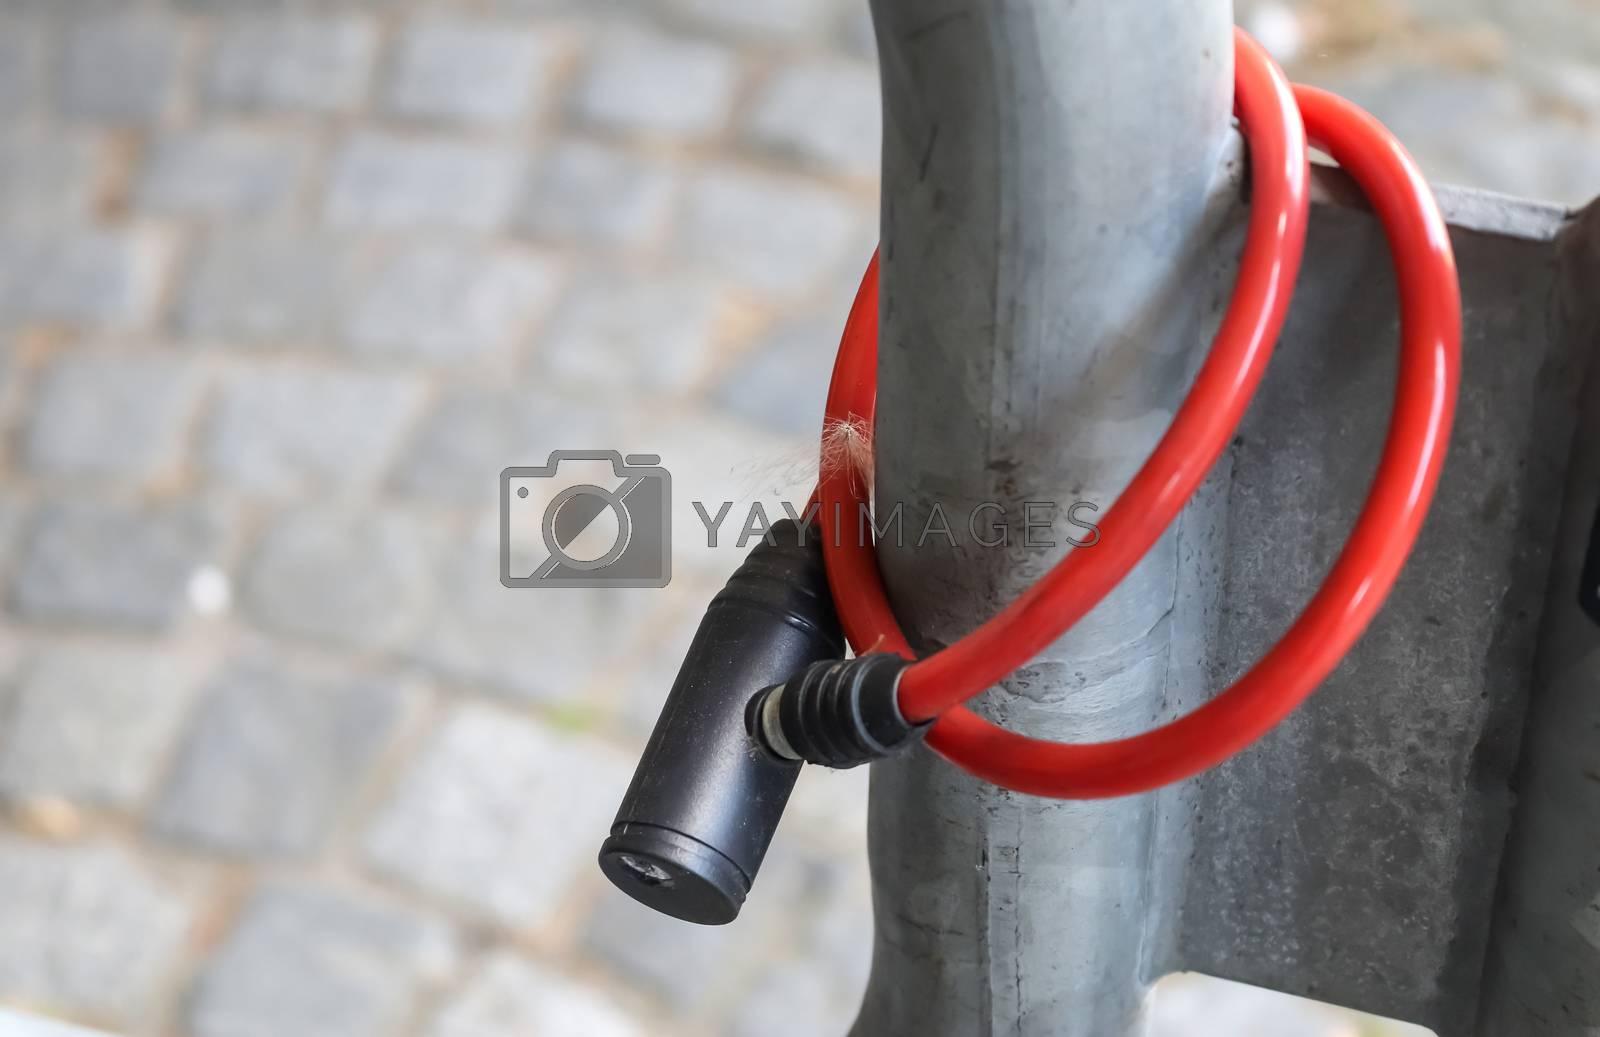 Abandoned bike lock left at a metallic fence. Bike stolen.